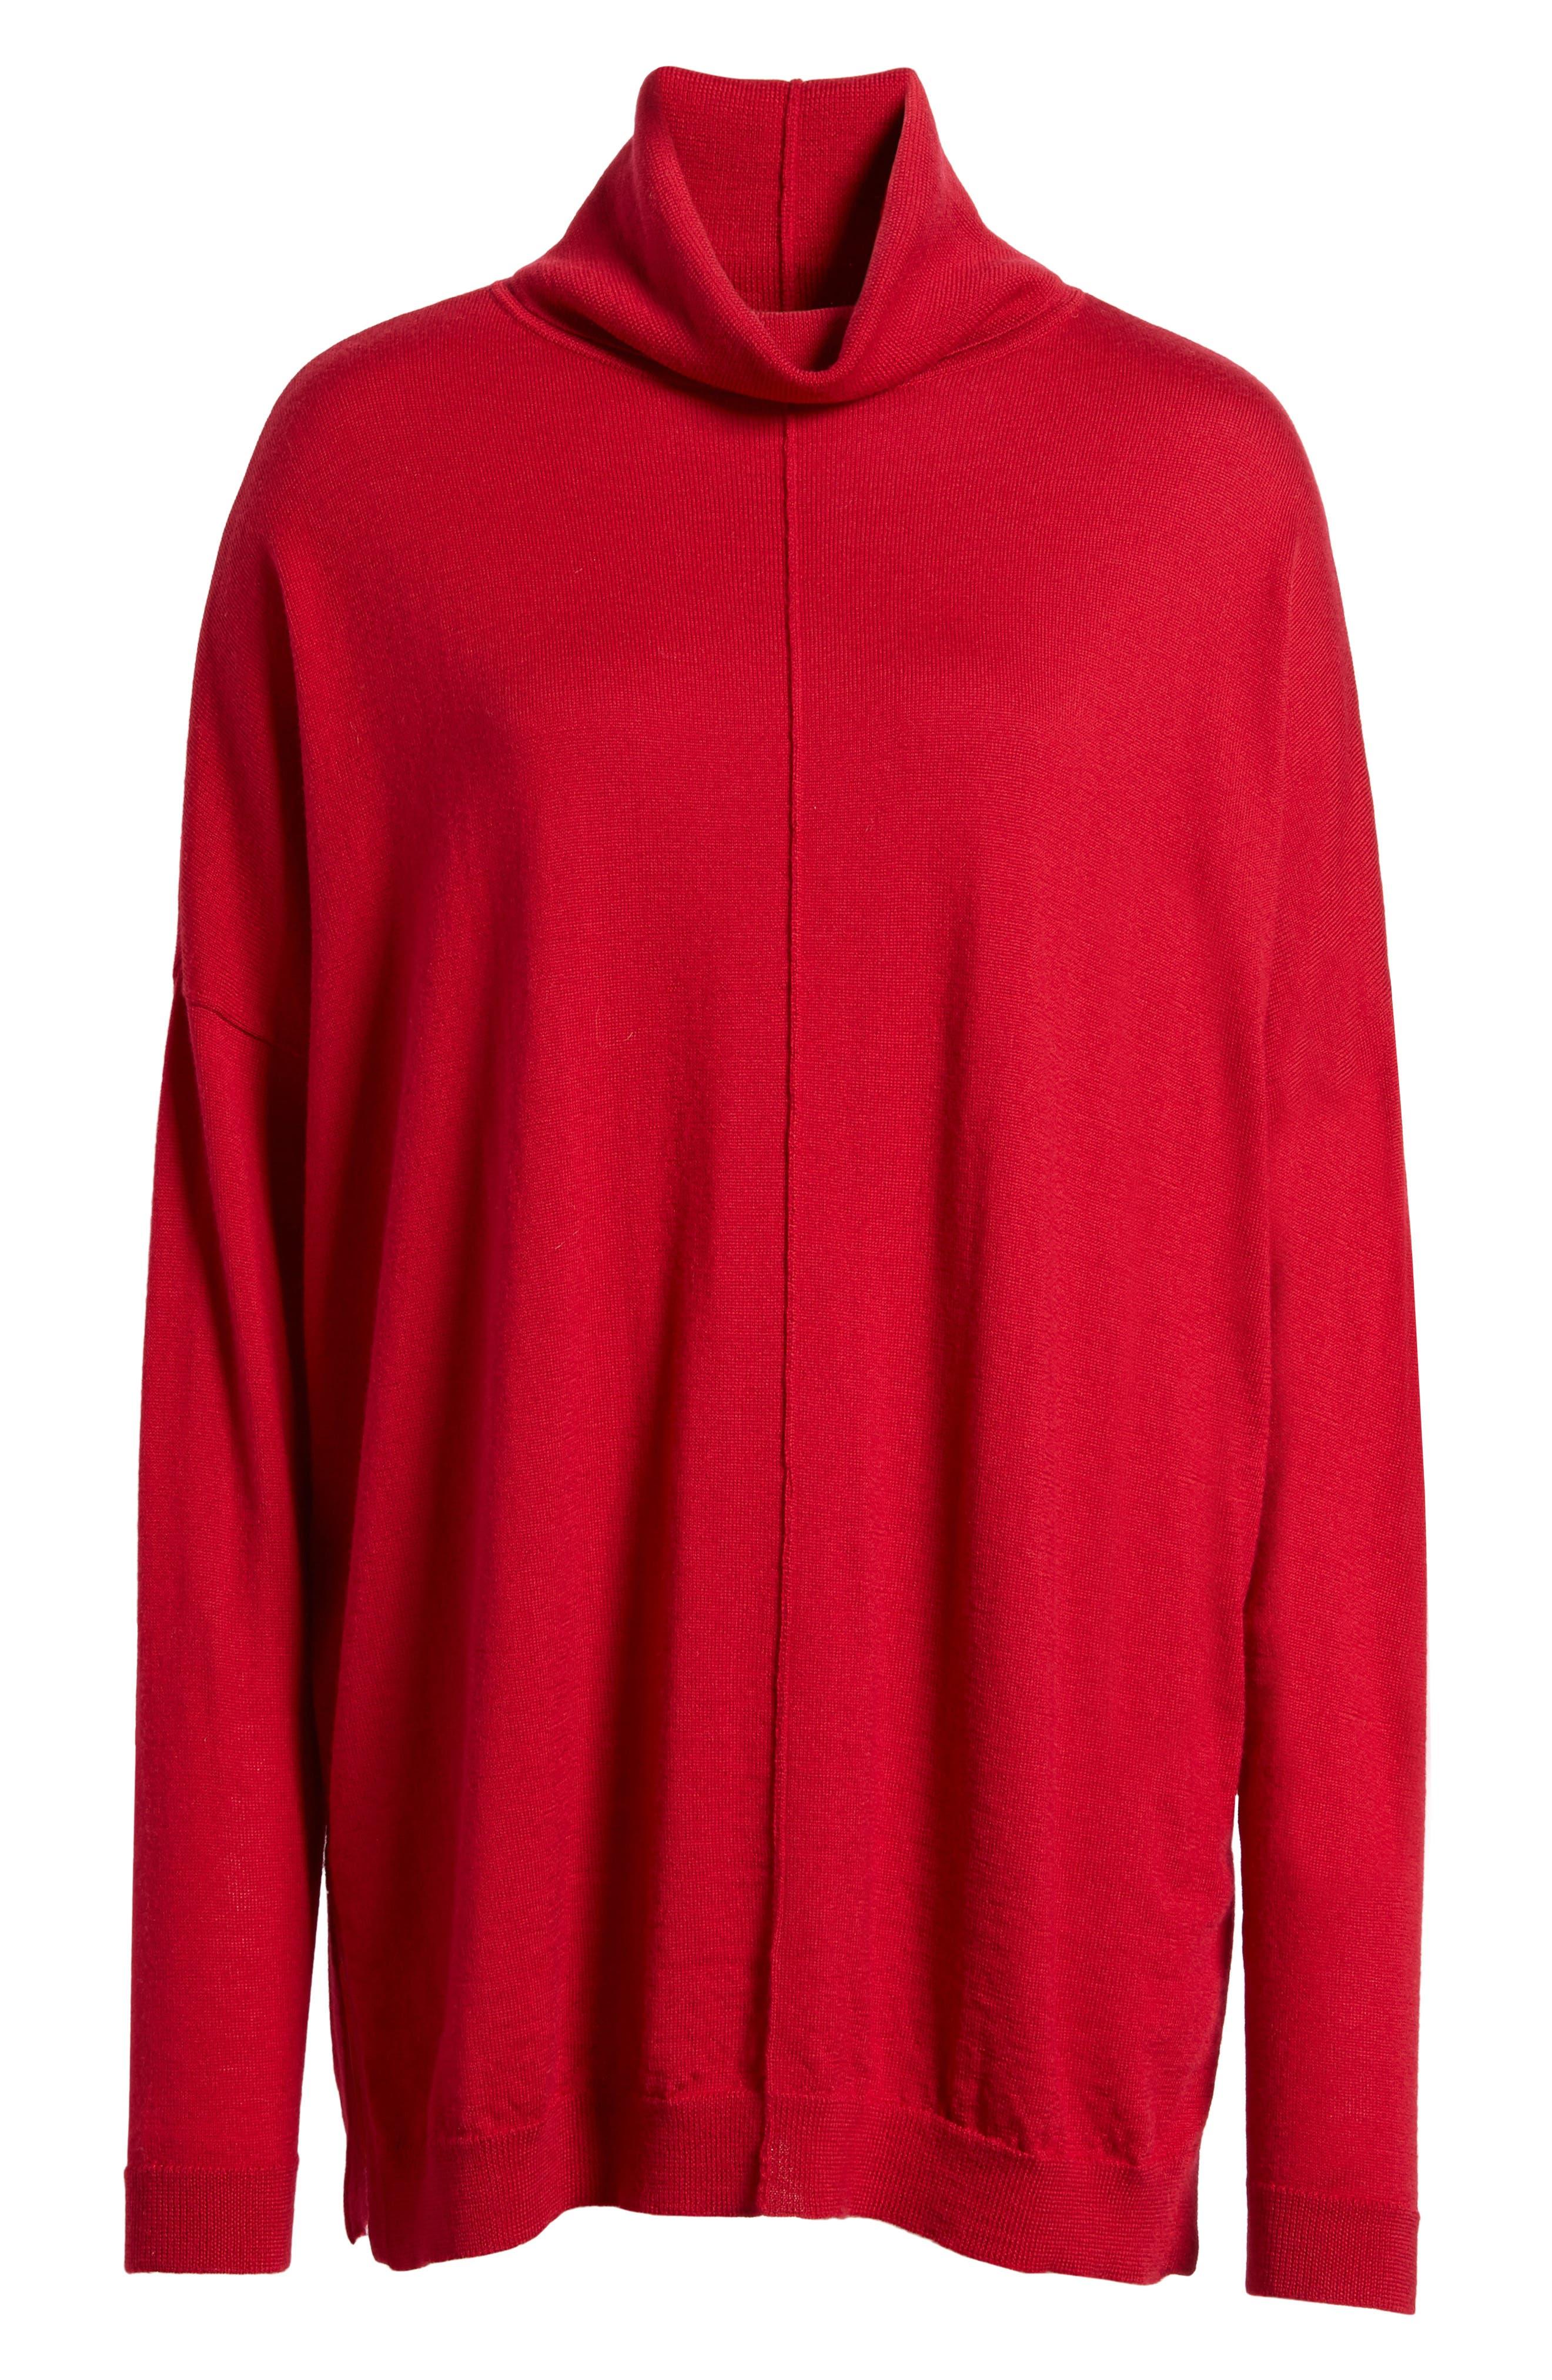 Merino Wool Boxy Turtleneck Sweater,                             Alternate thumbnail 36, color,